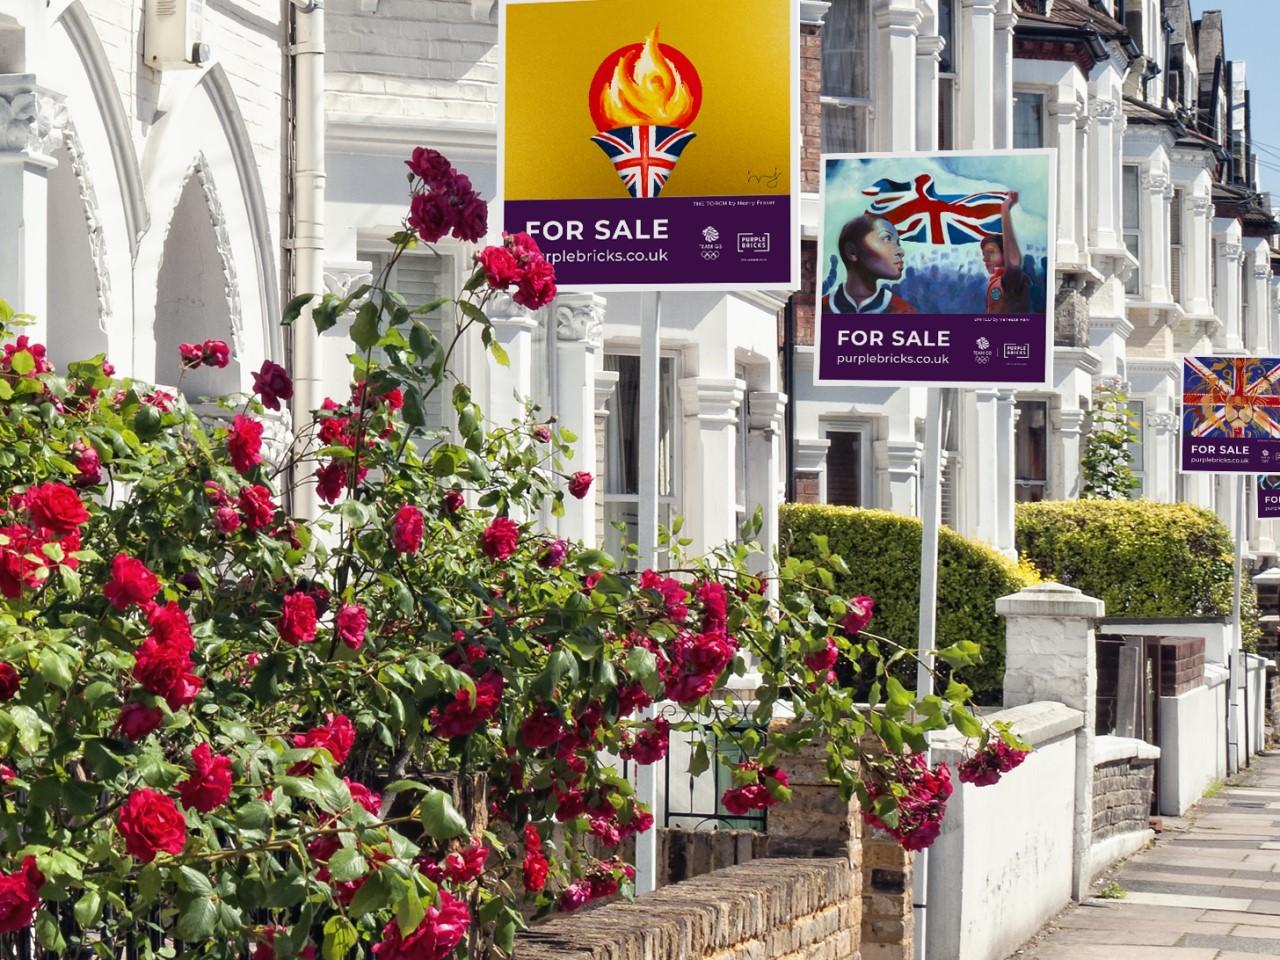 edwardian-street-sale-3sale-home-support.jpg